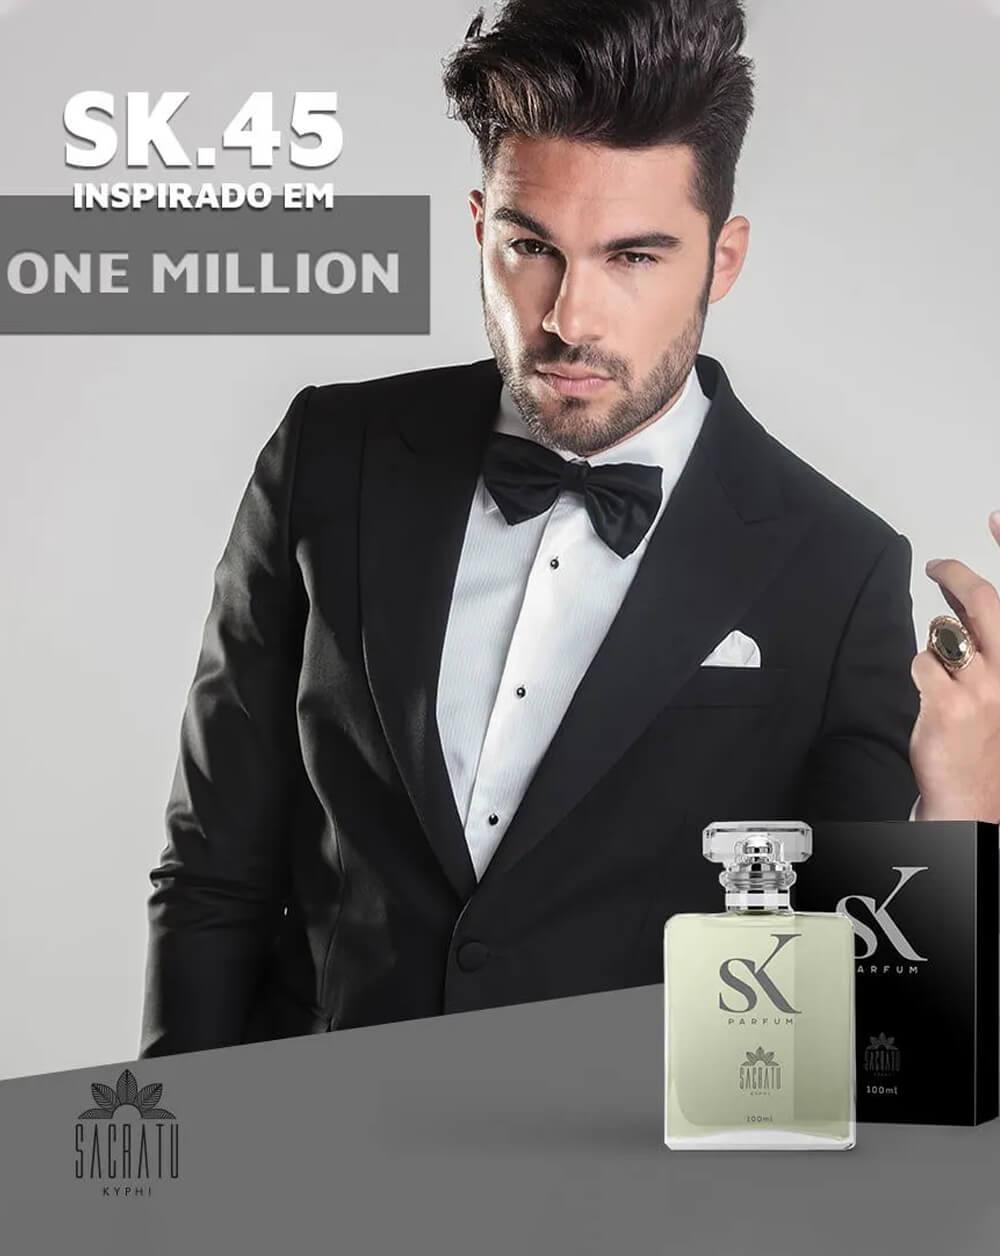 SK 45 Inspirado no One Million by Paco Rabanne